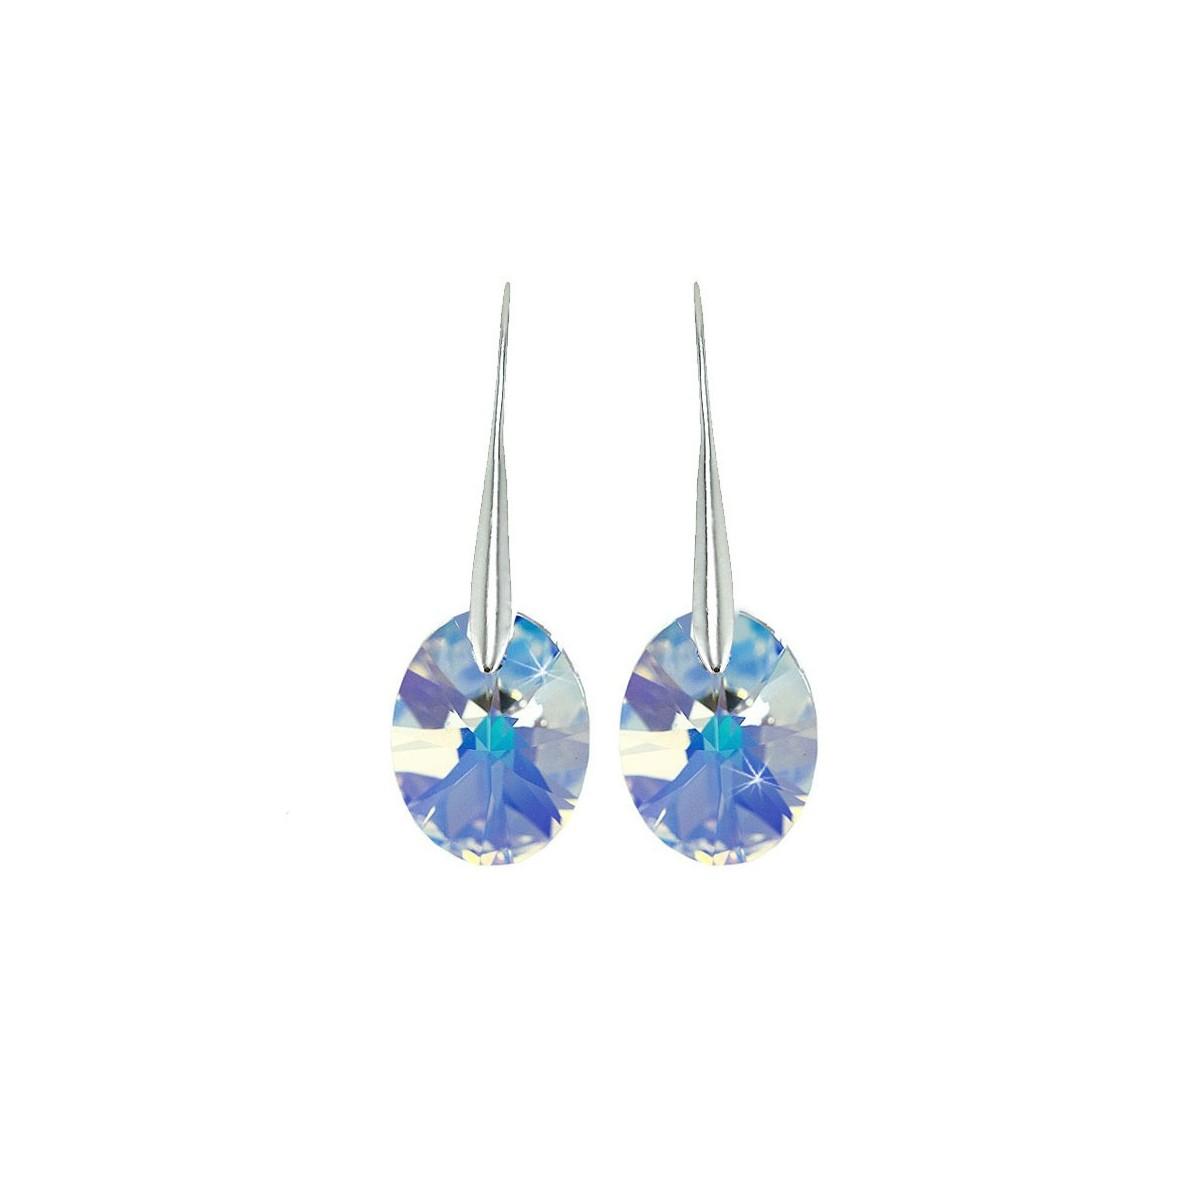 BS008-SE003-IRIS Boucles d'oreilles So Charm ornées d'un cristal irisé made with crystal from Swarovski